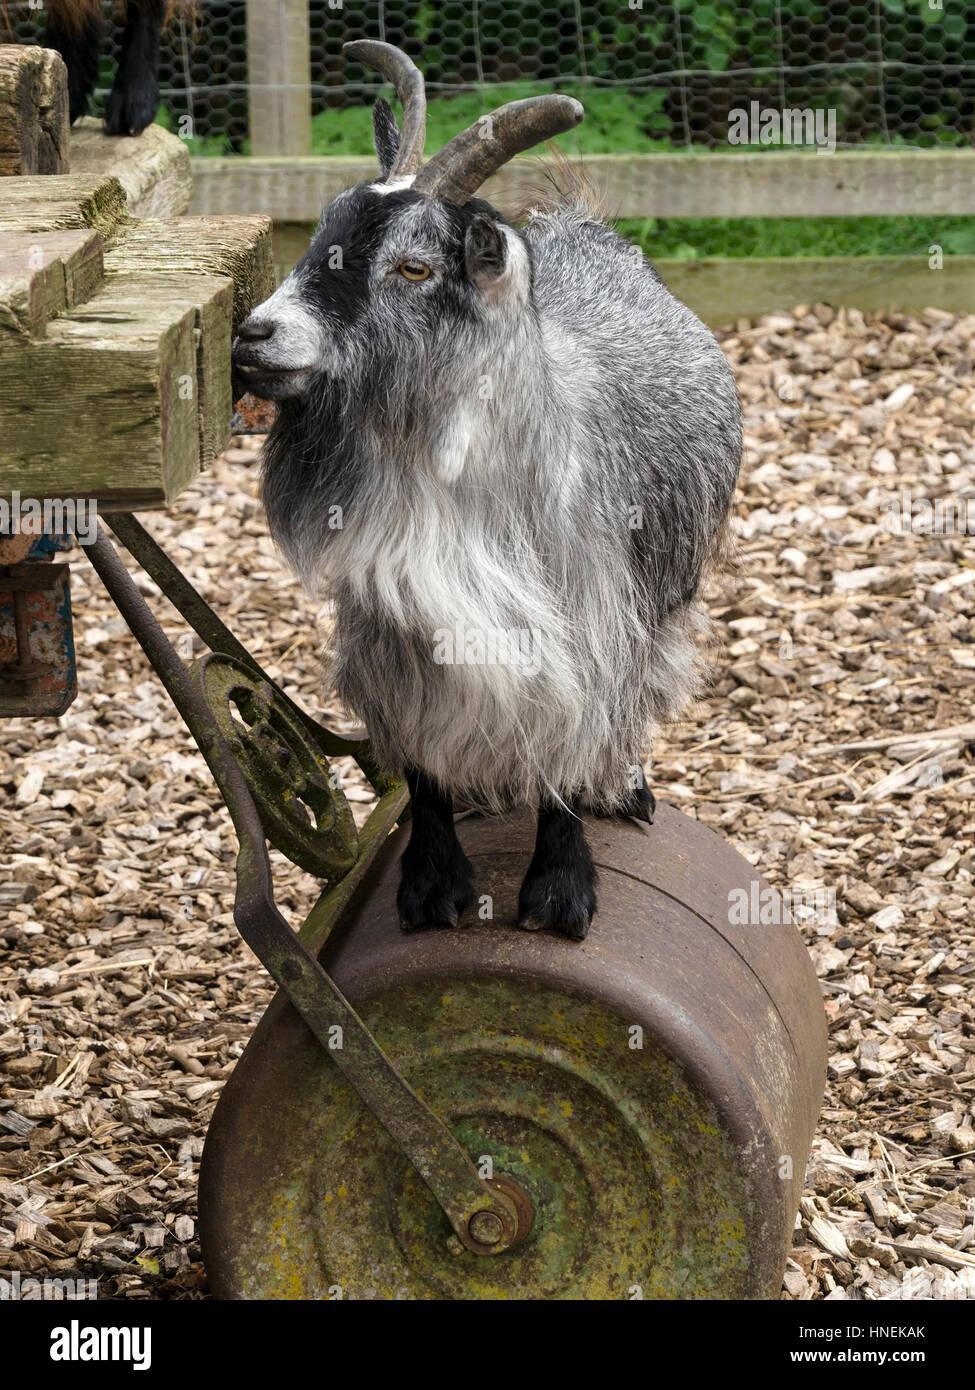 Small pygmy goat standing on garden roller, England, UK - Stock Image